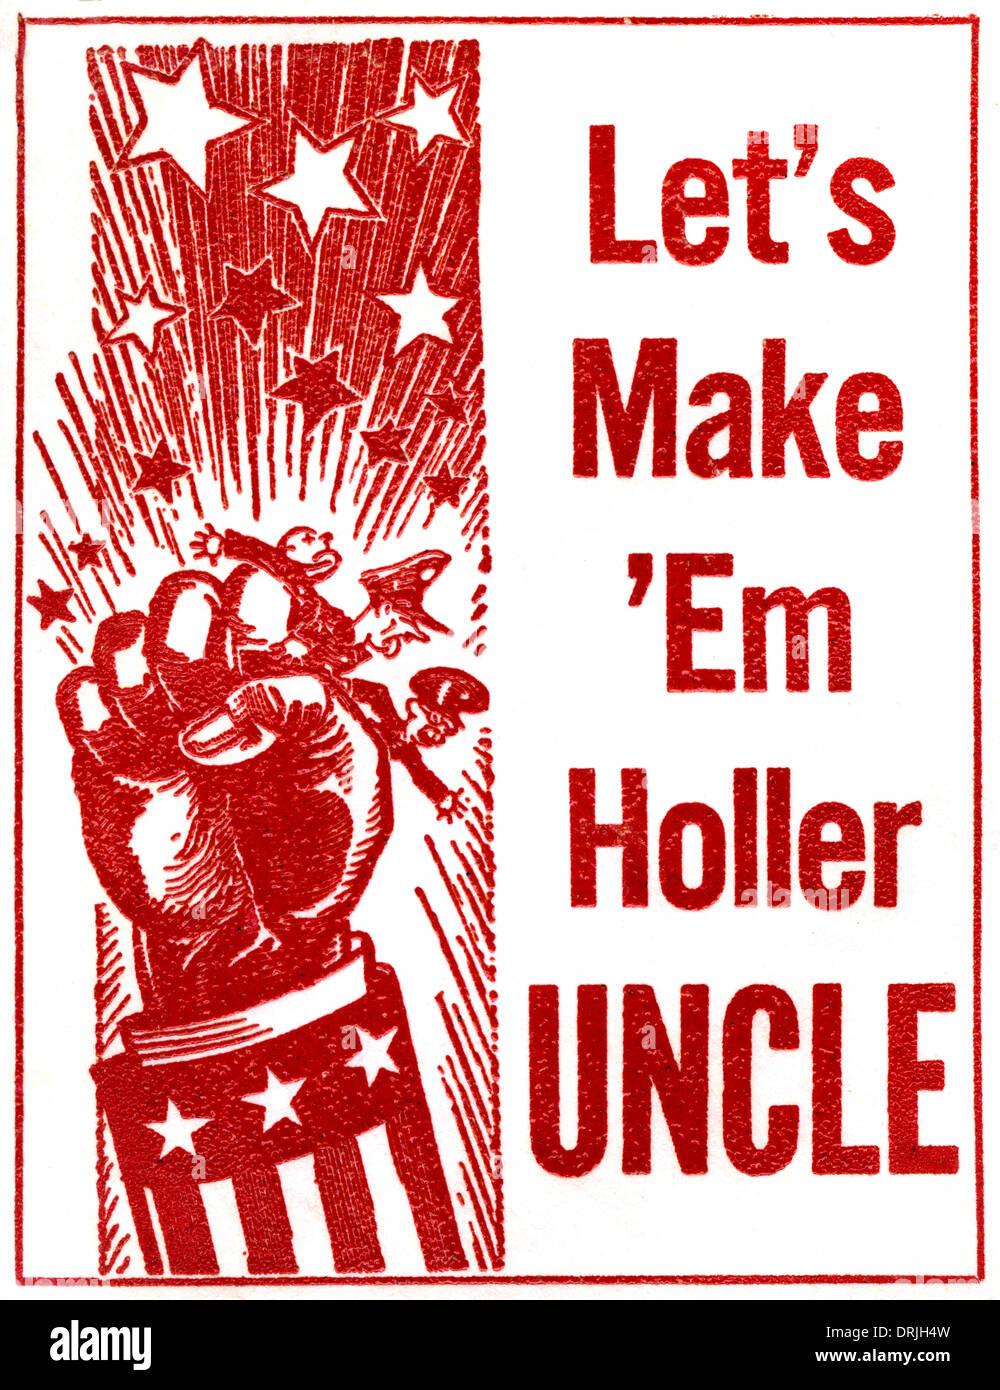 Let's Make em Holler Uncle - USA - WW2 Propaganda - Stock Image